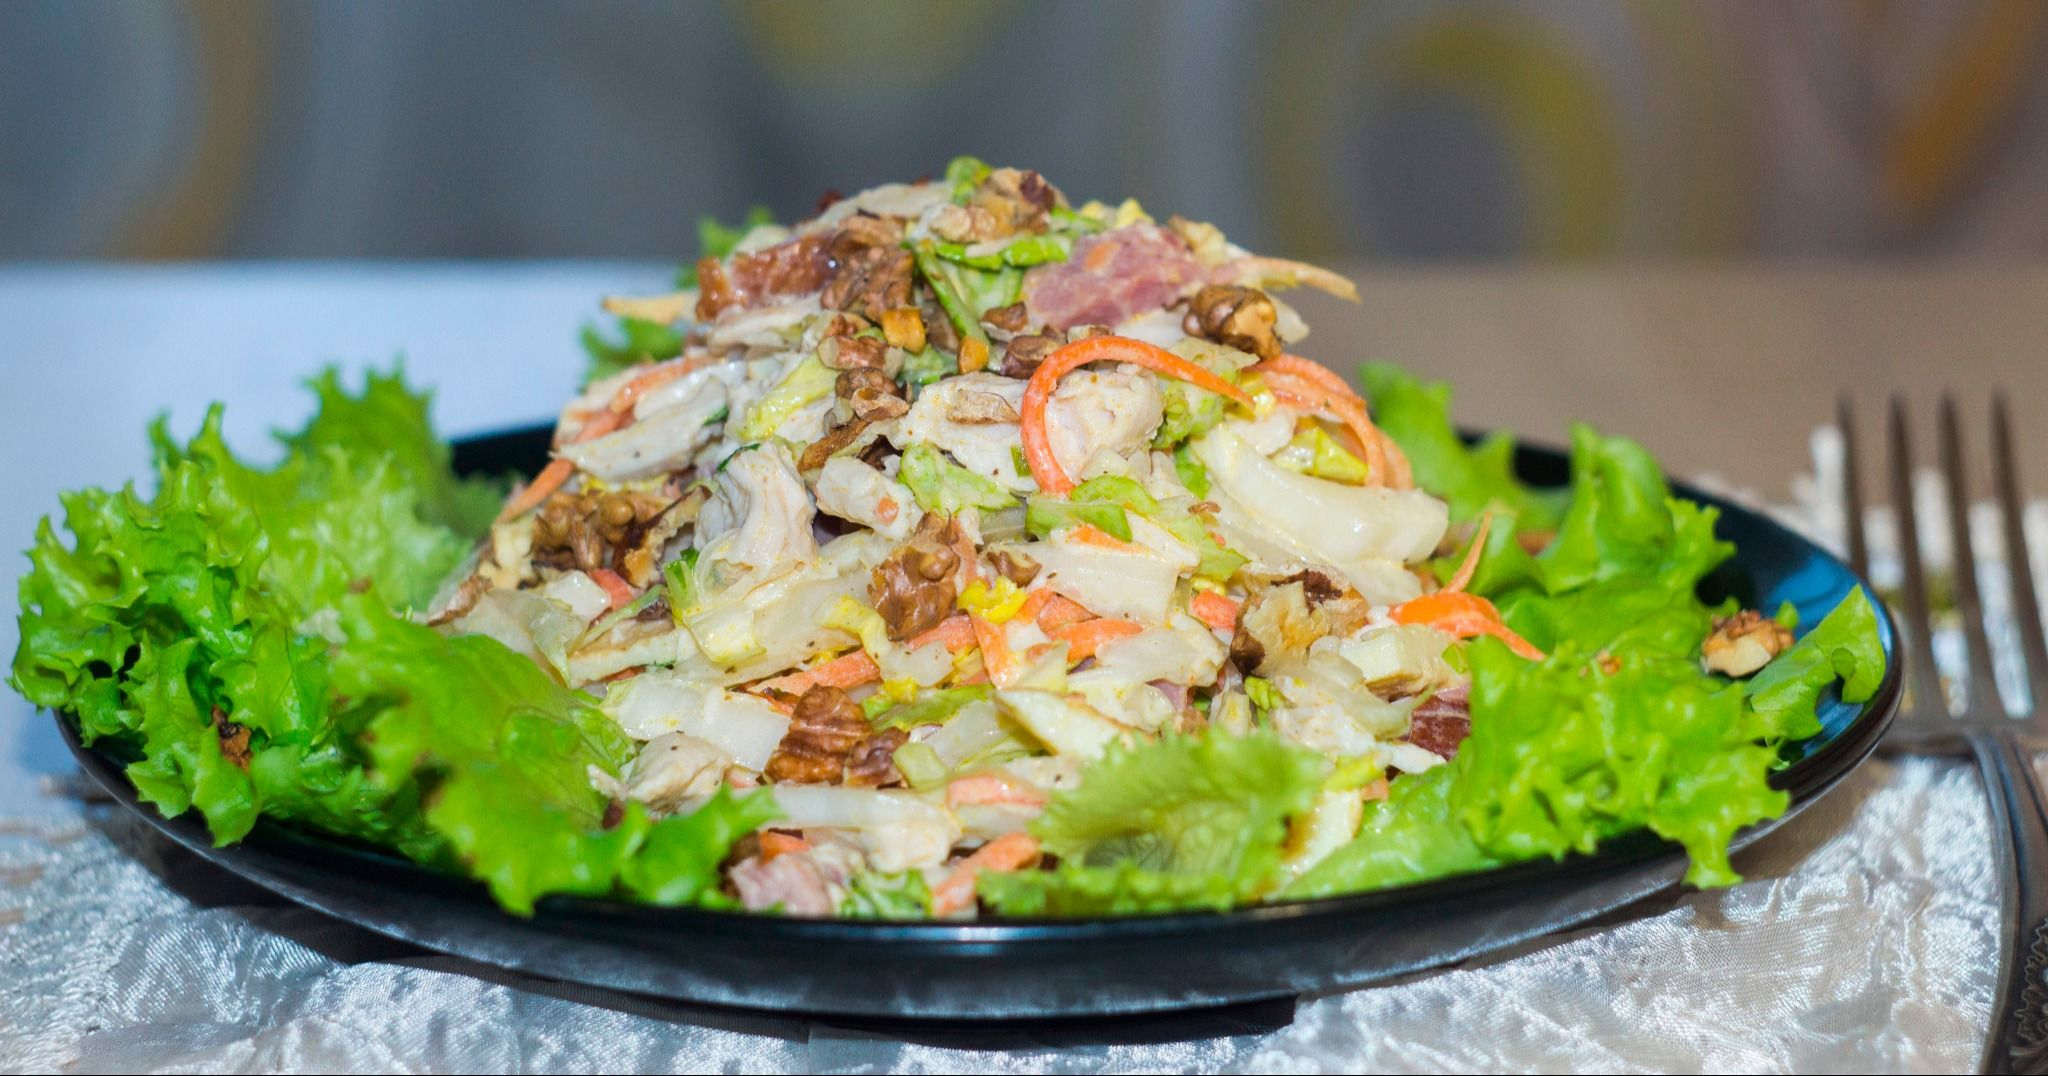 Салат Анастасия с корейской морковкой | Рецепт | Еда и ...